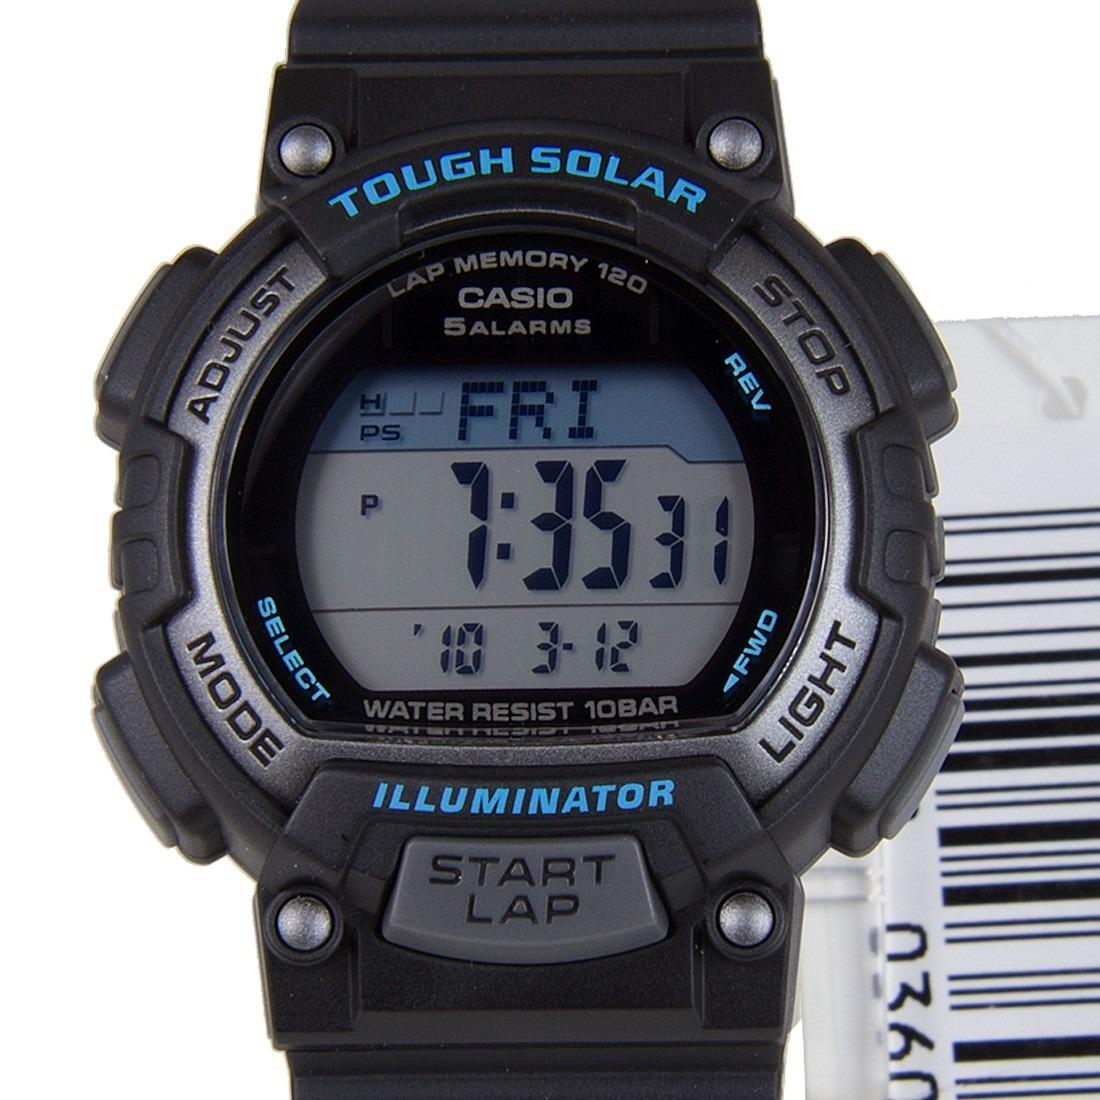 448d974ff2c0 Reloj Casio Phys Stl-s300 Dama Sport Energía Solar -   819.00 en ...